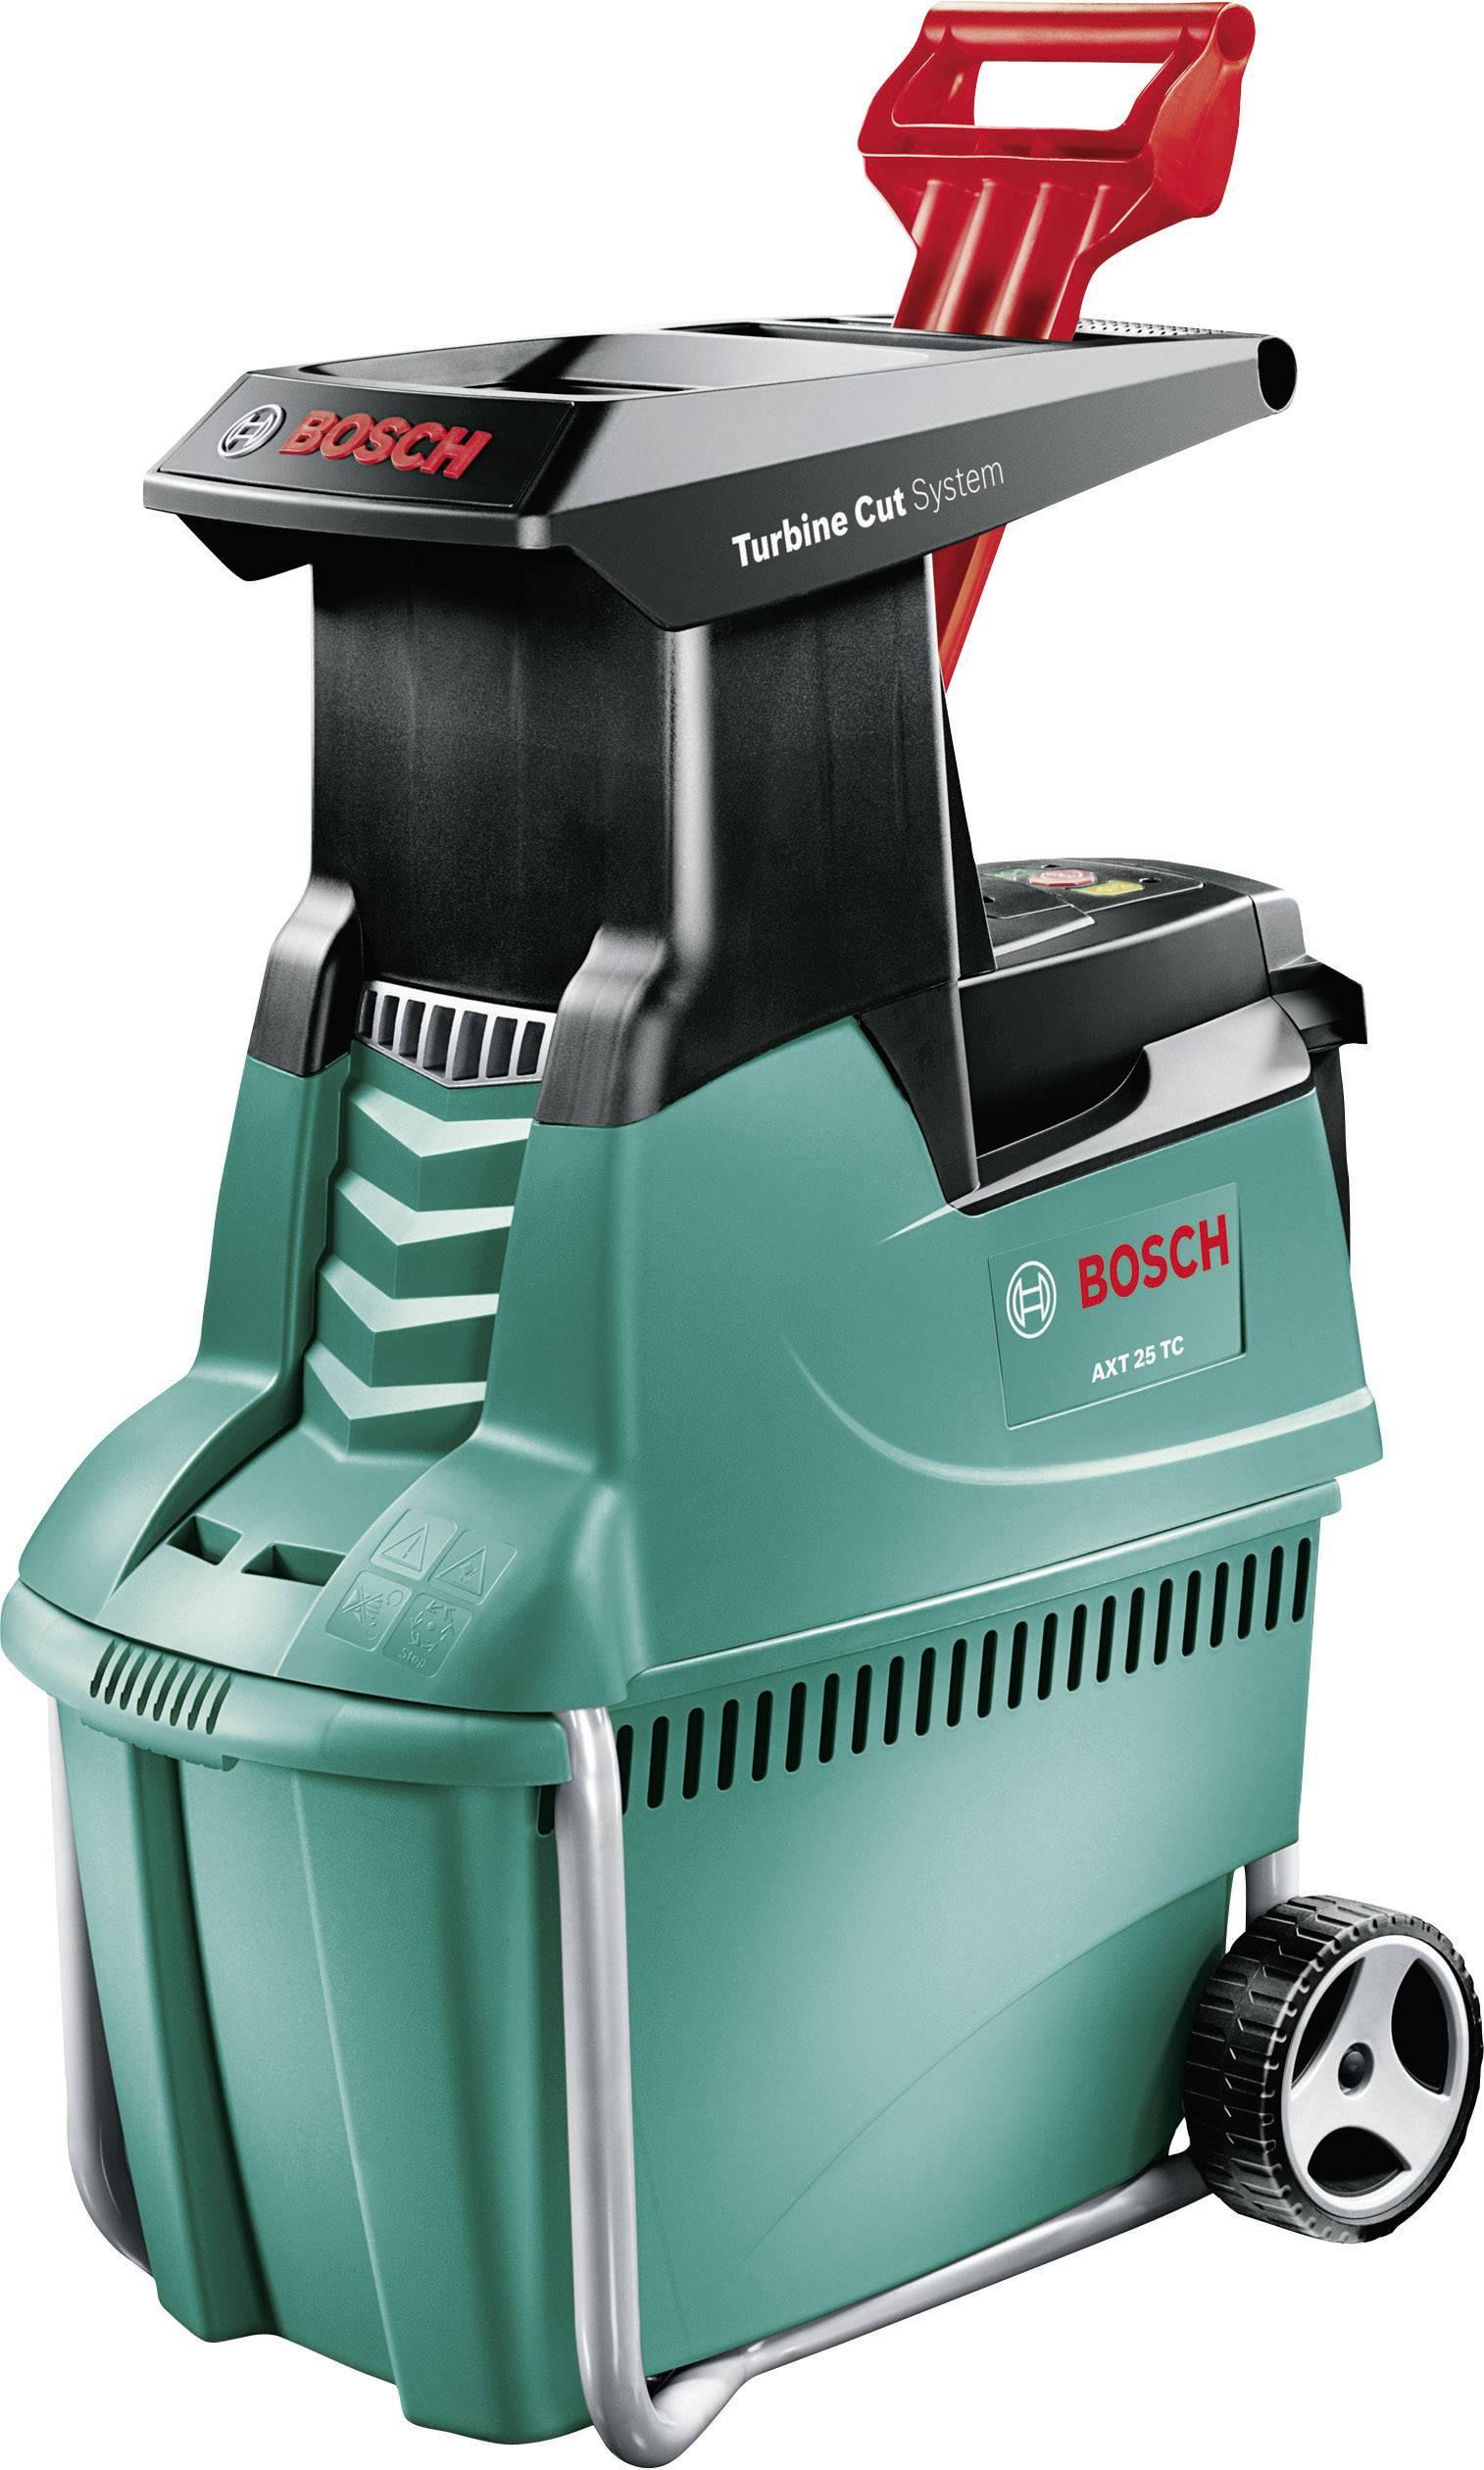 Elektrická válcový zahradní drtič AXT 25 TC Bosch Home and Garden 2500 W 0600803300